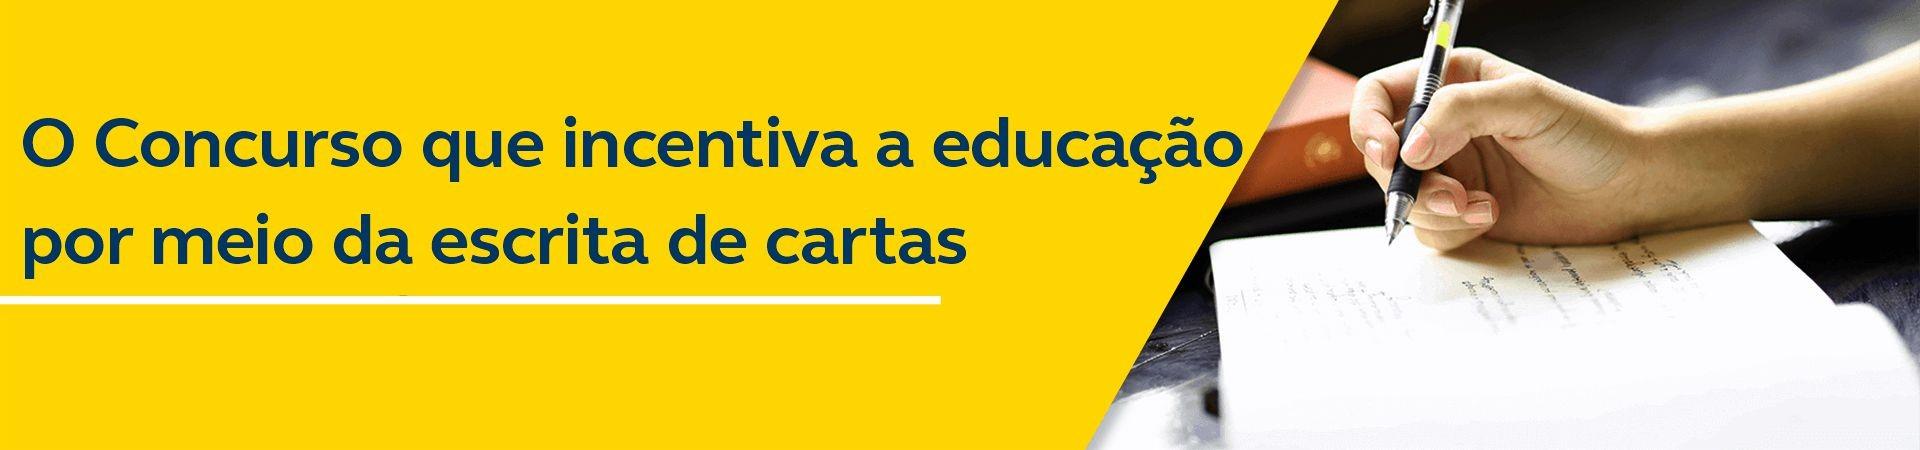 Banner Concurso Internacional de Cartas - Desktop